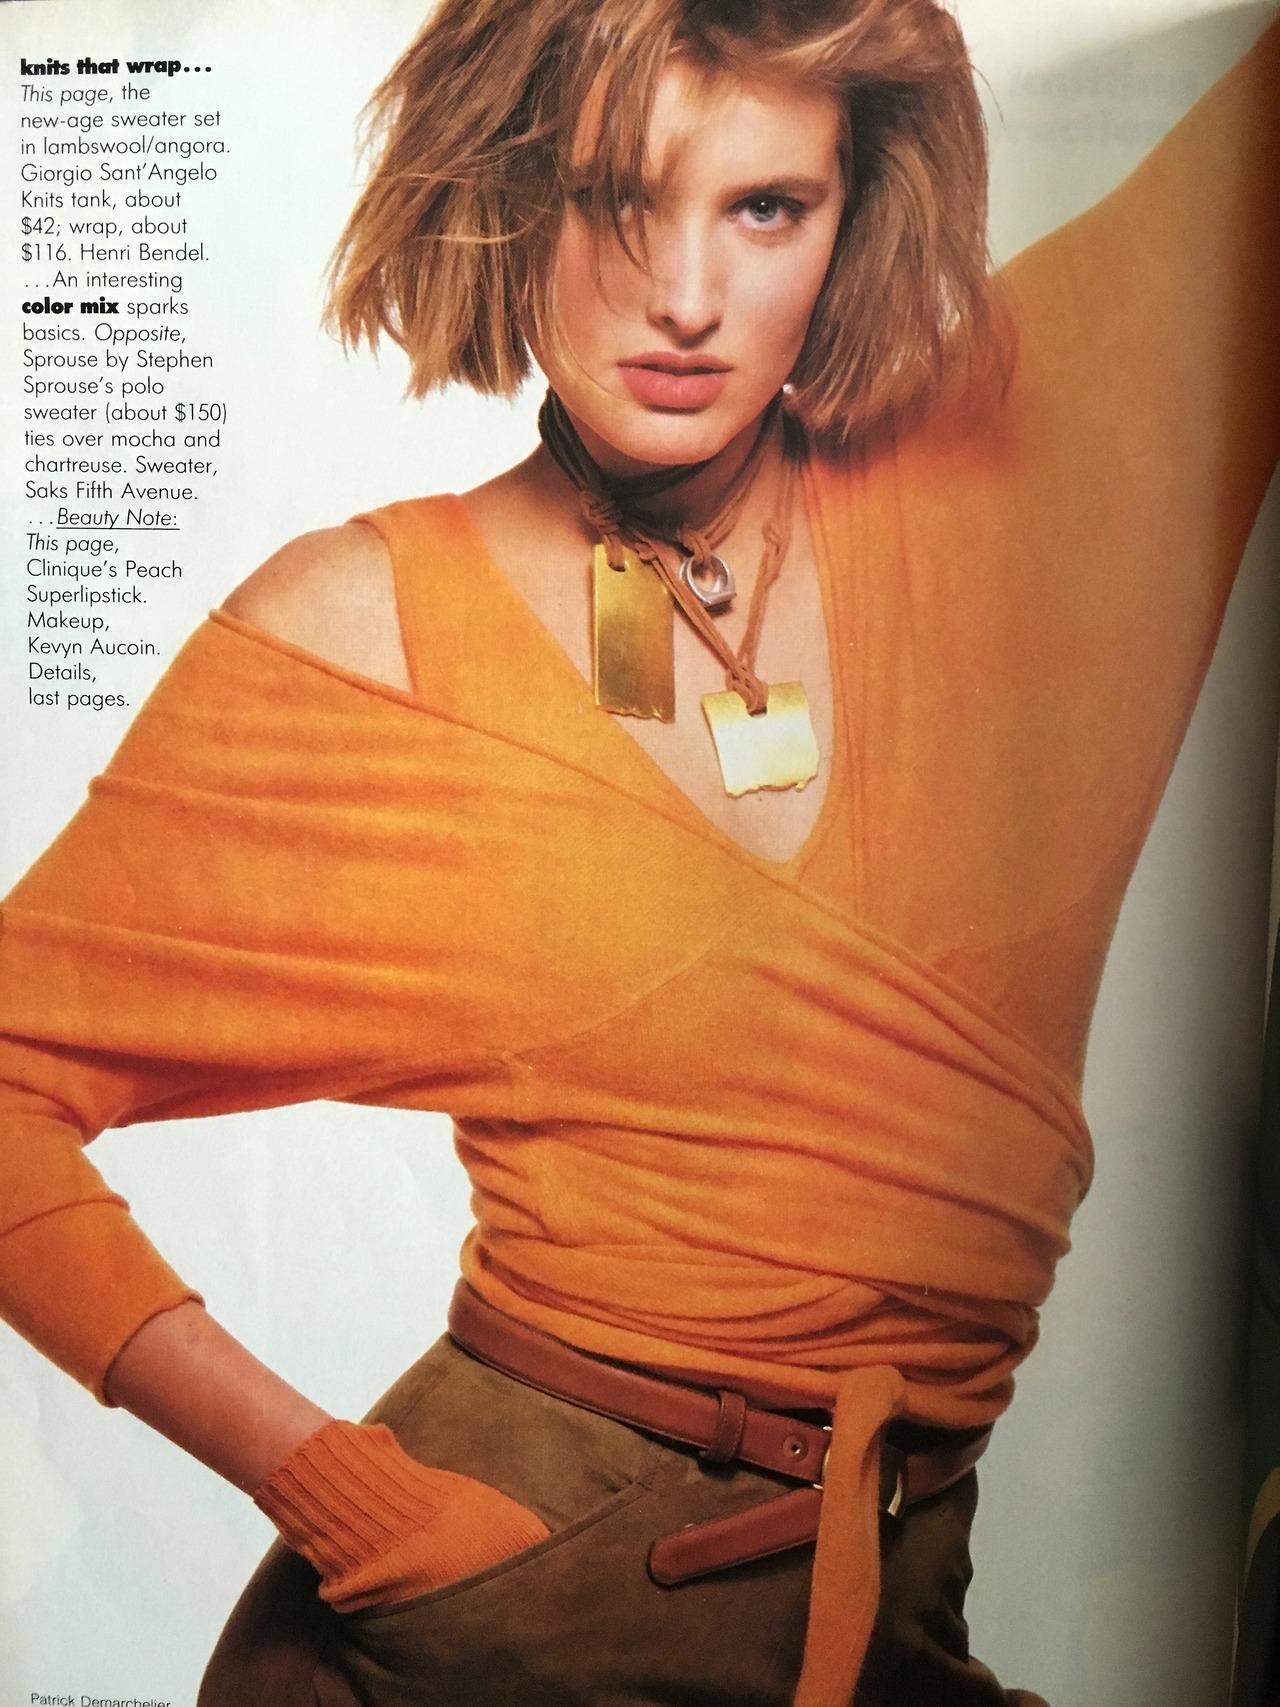 Vogue. June 1988.